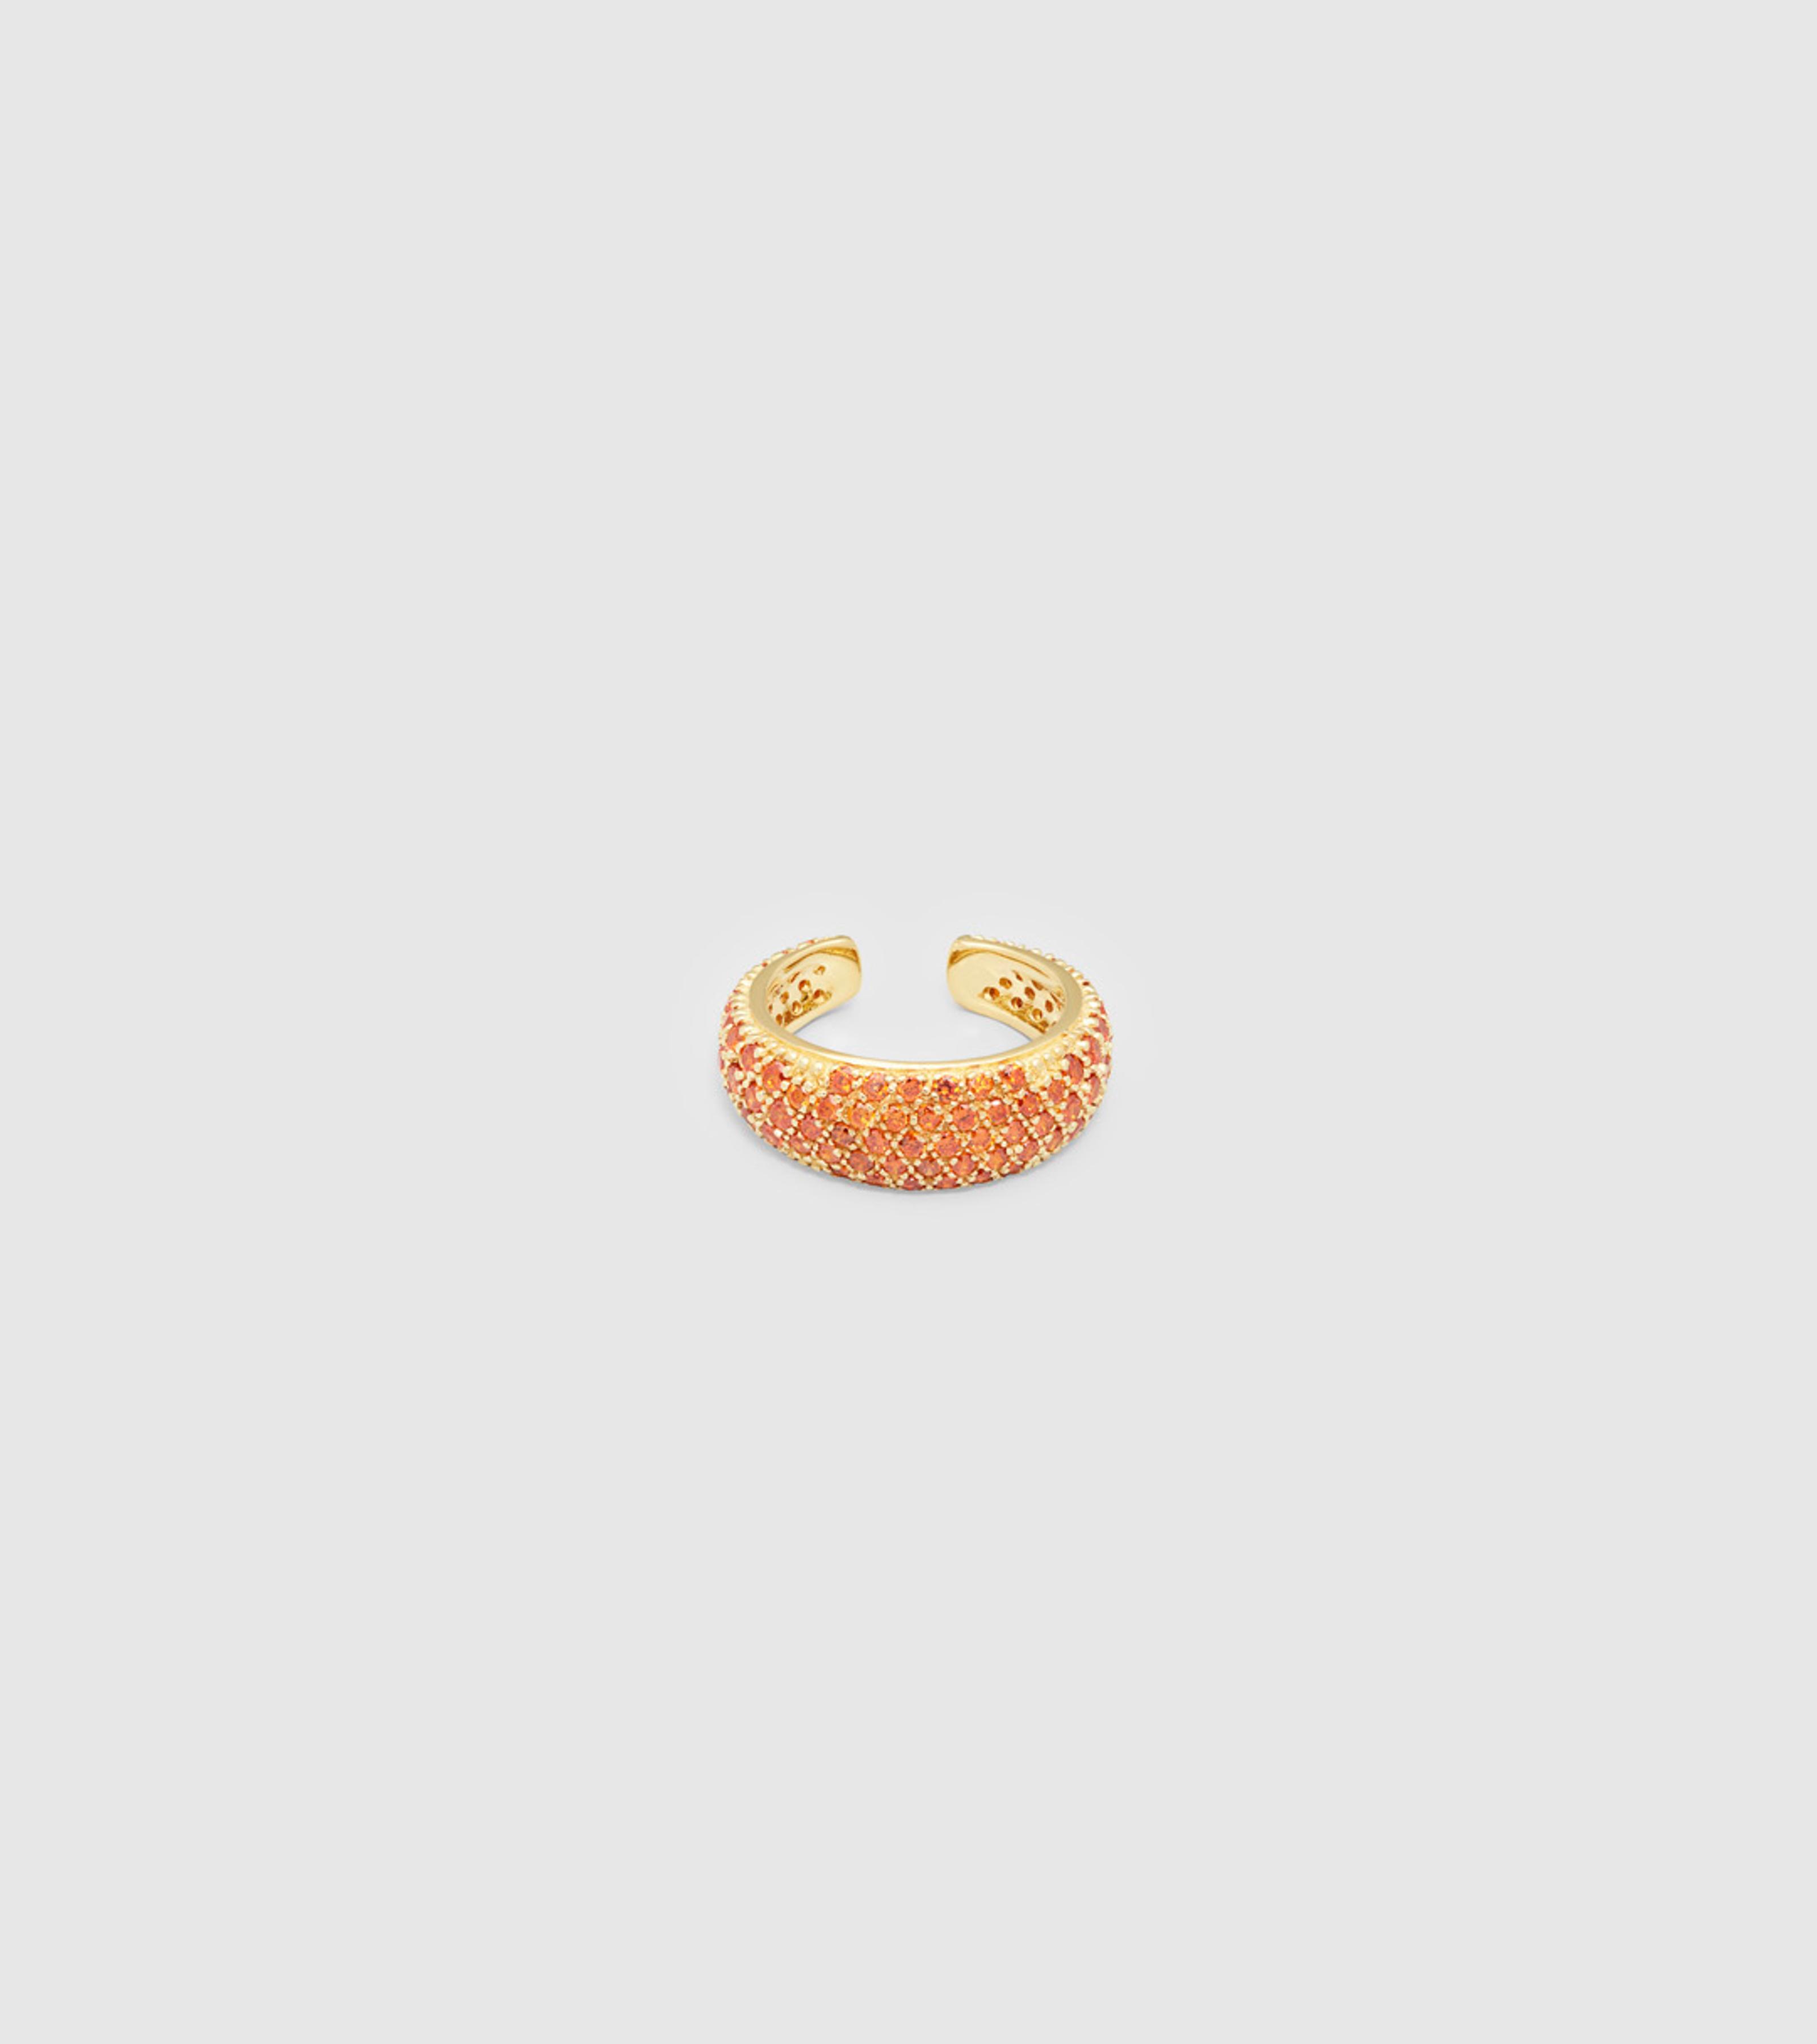 Ear Cuff Thick Orange Gold